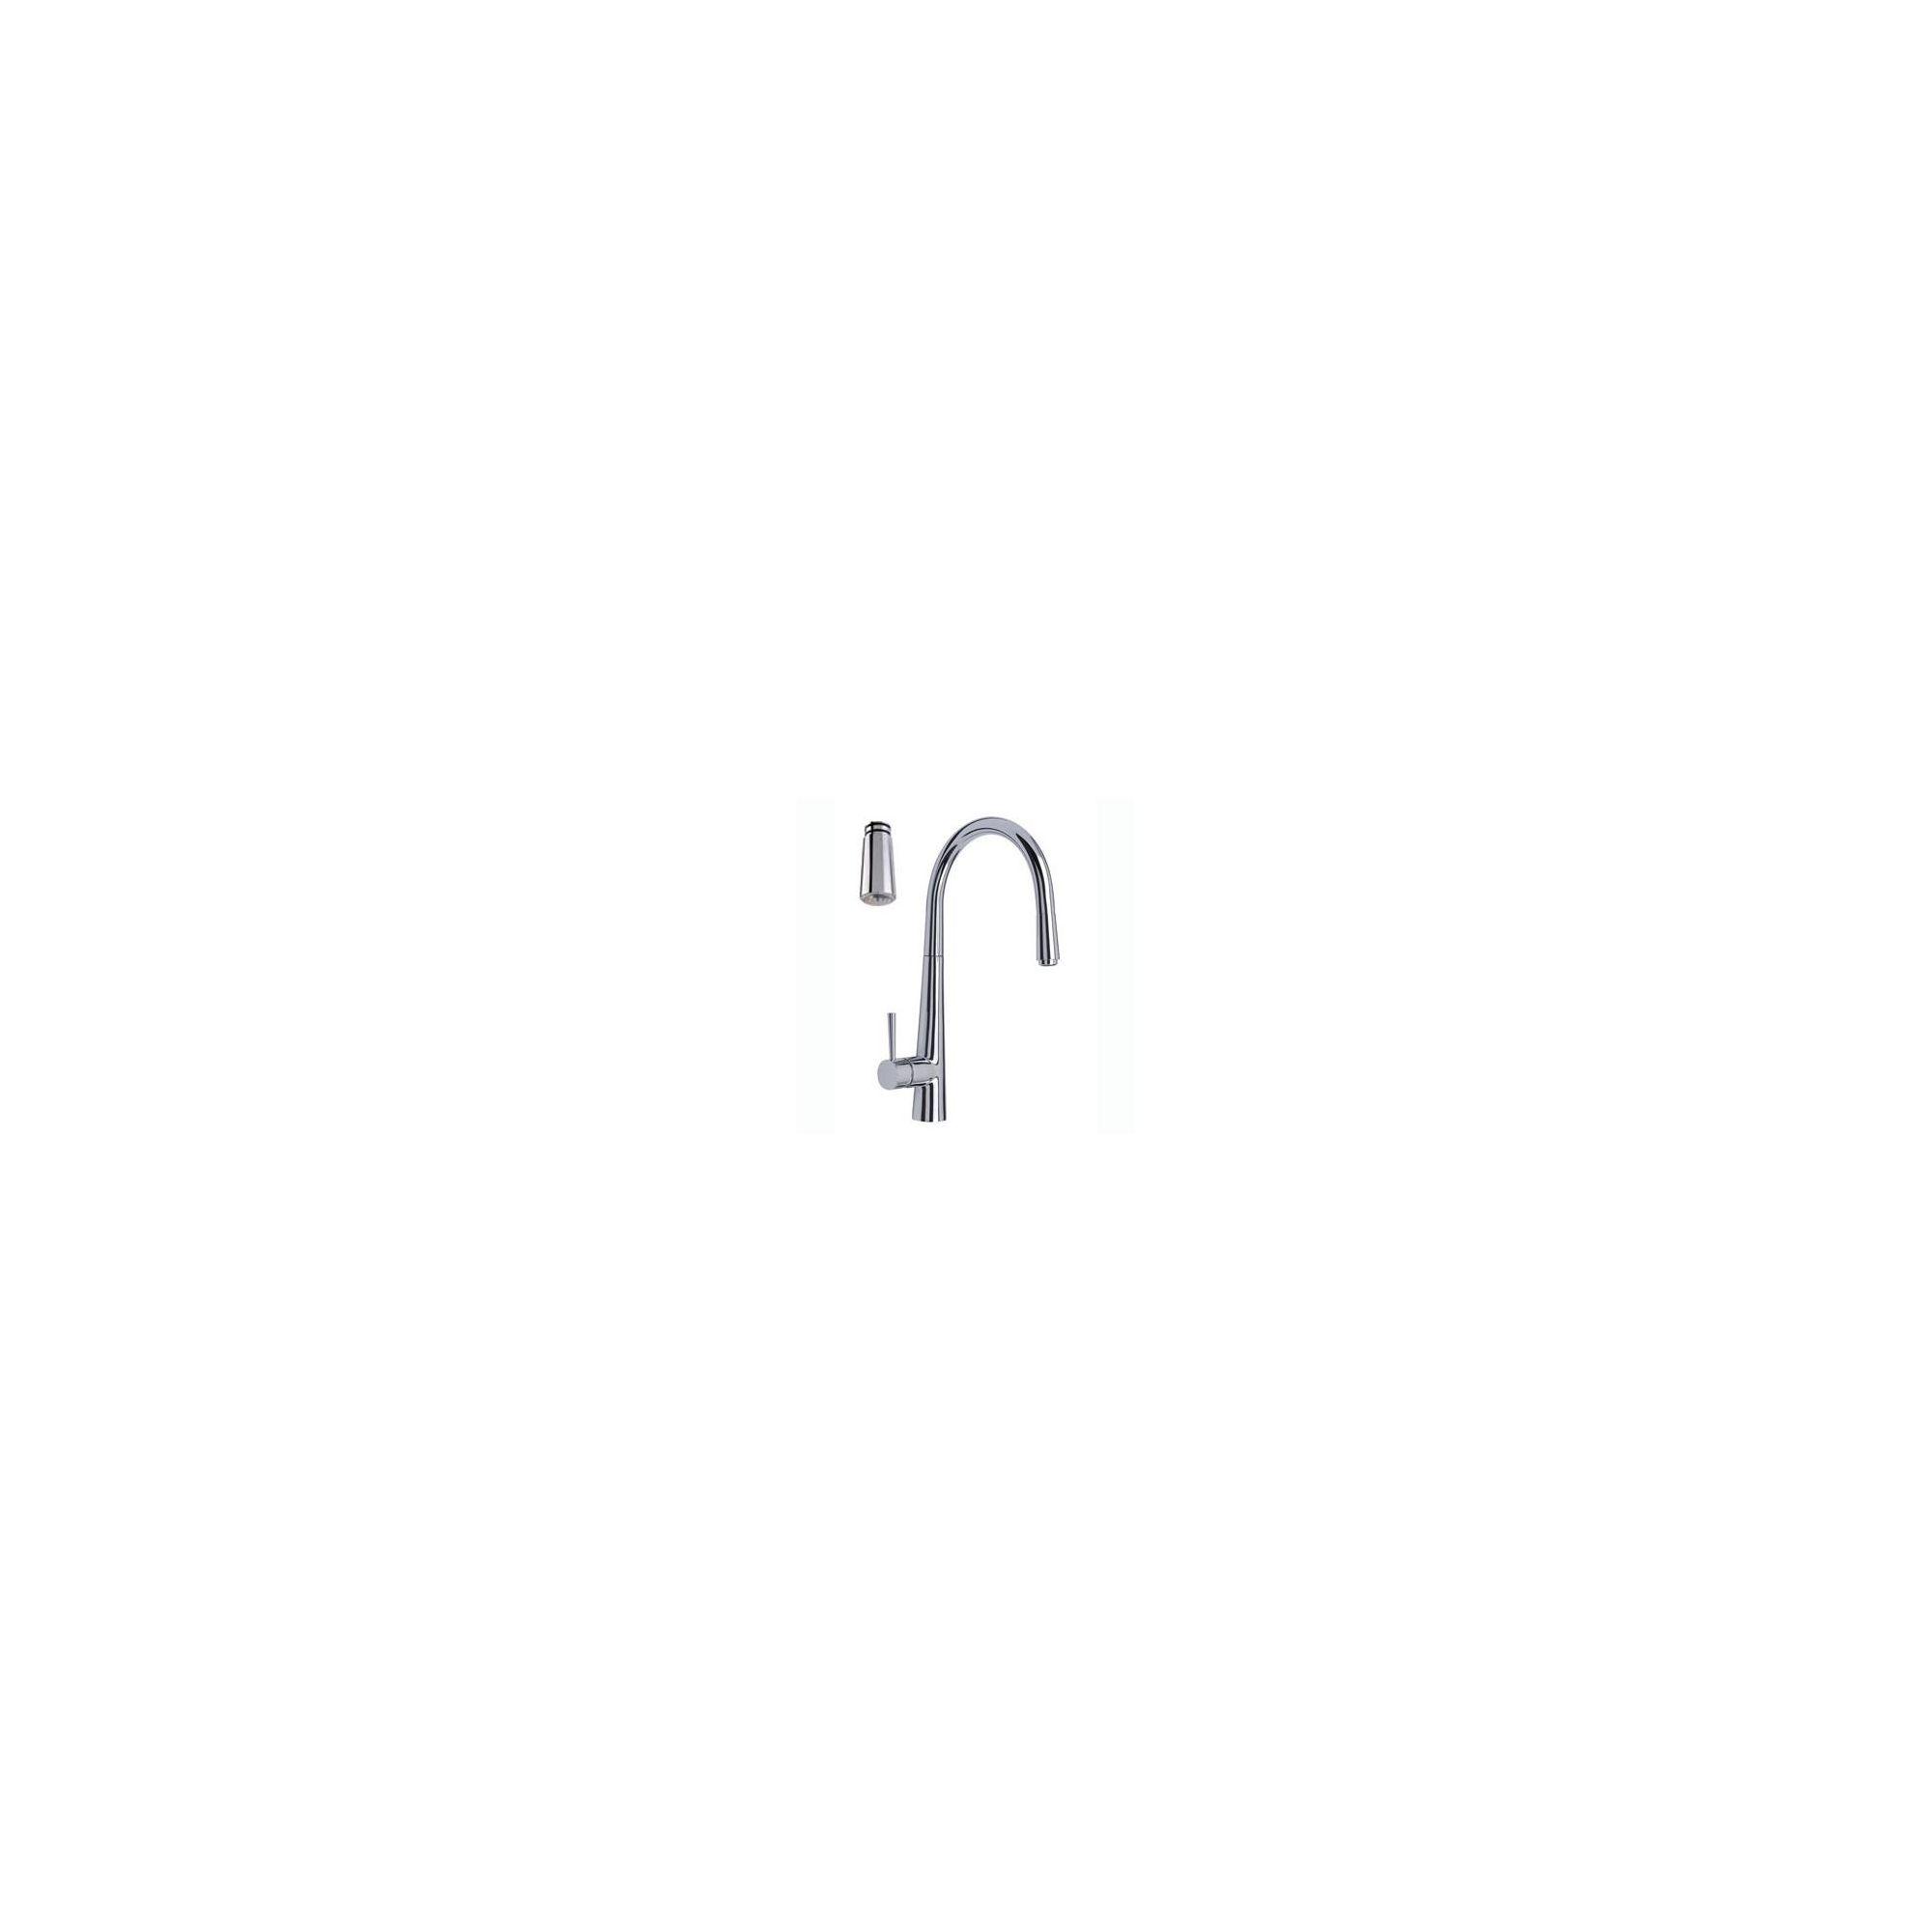 Mayfair Plazzo Glo Kitchen Sink Mixer Tap, Chrome at Tesco Direct